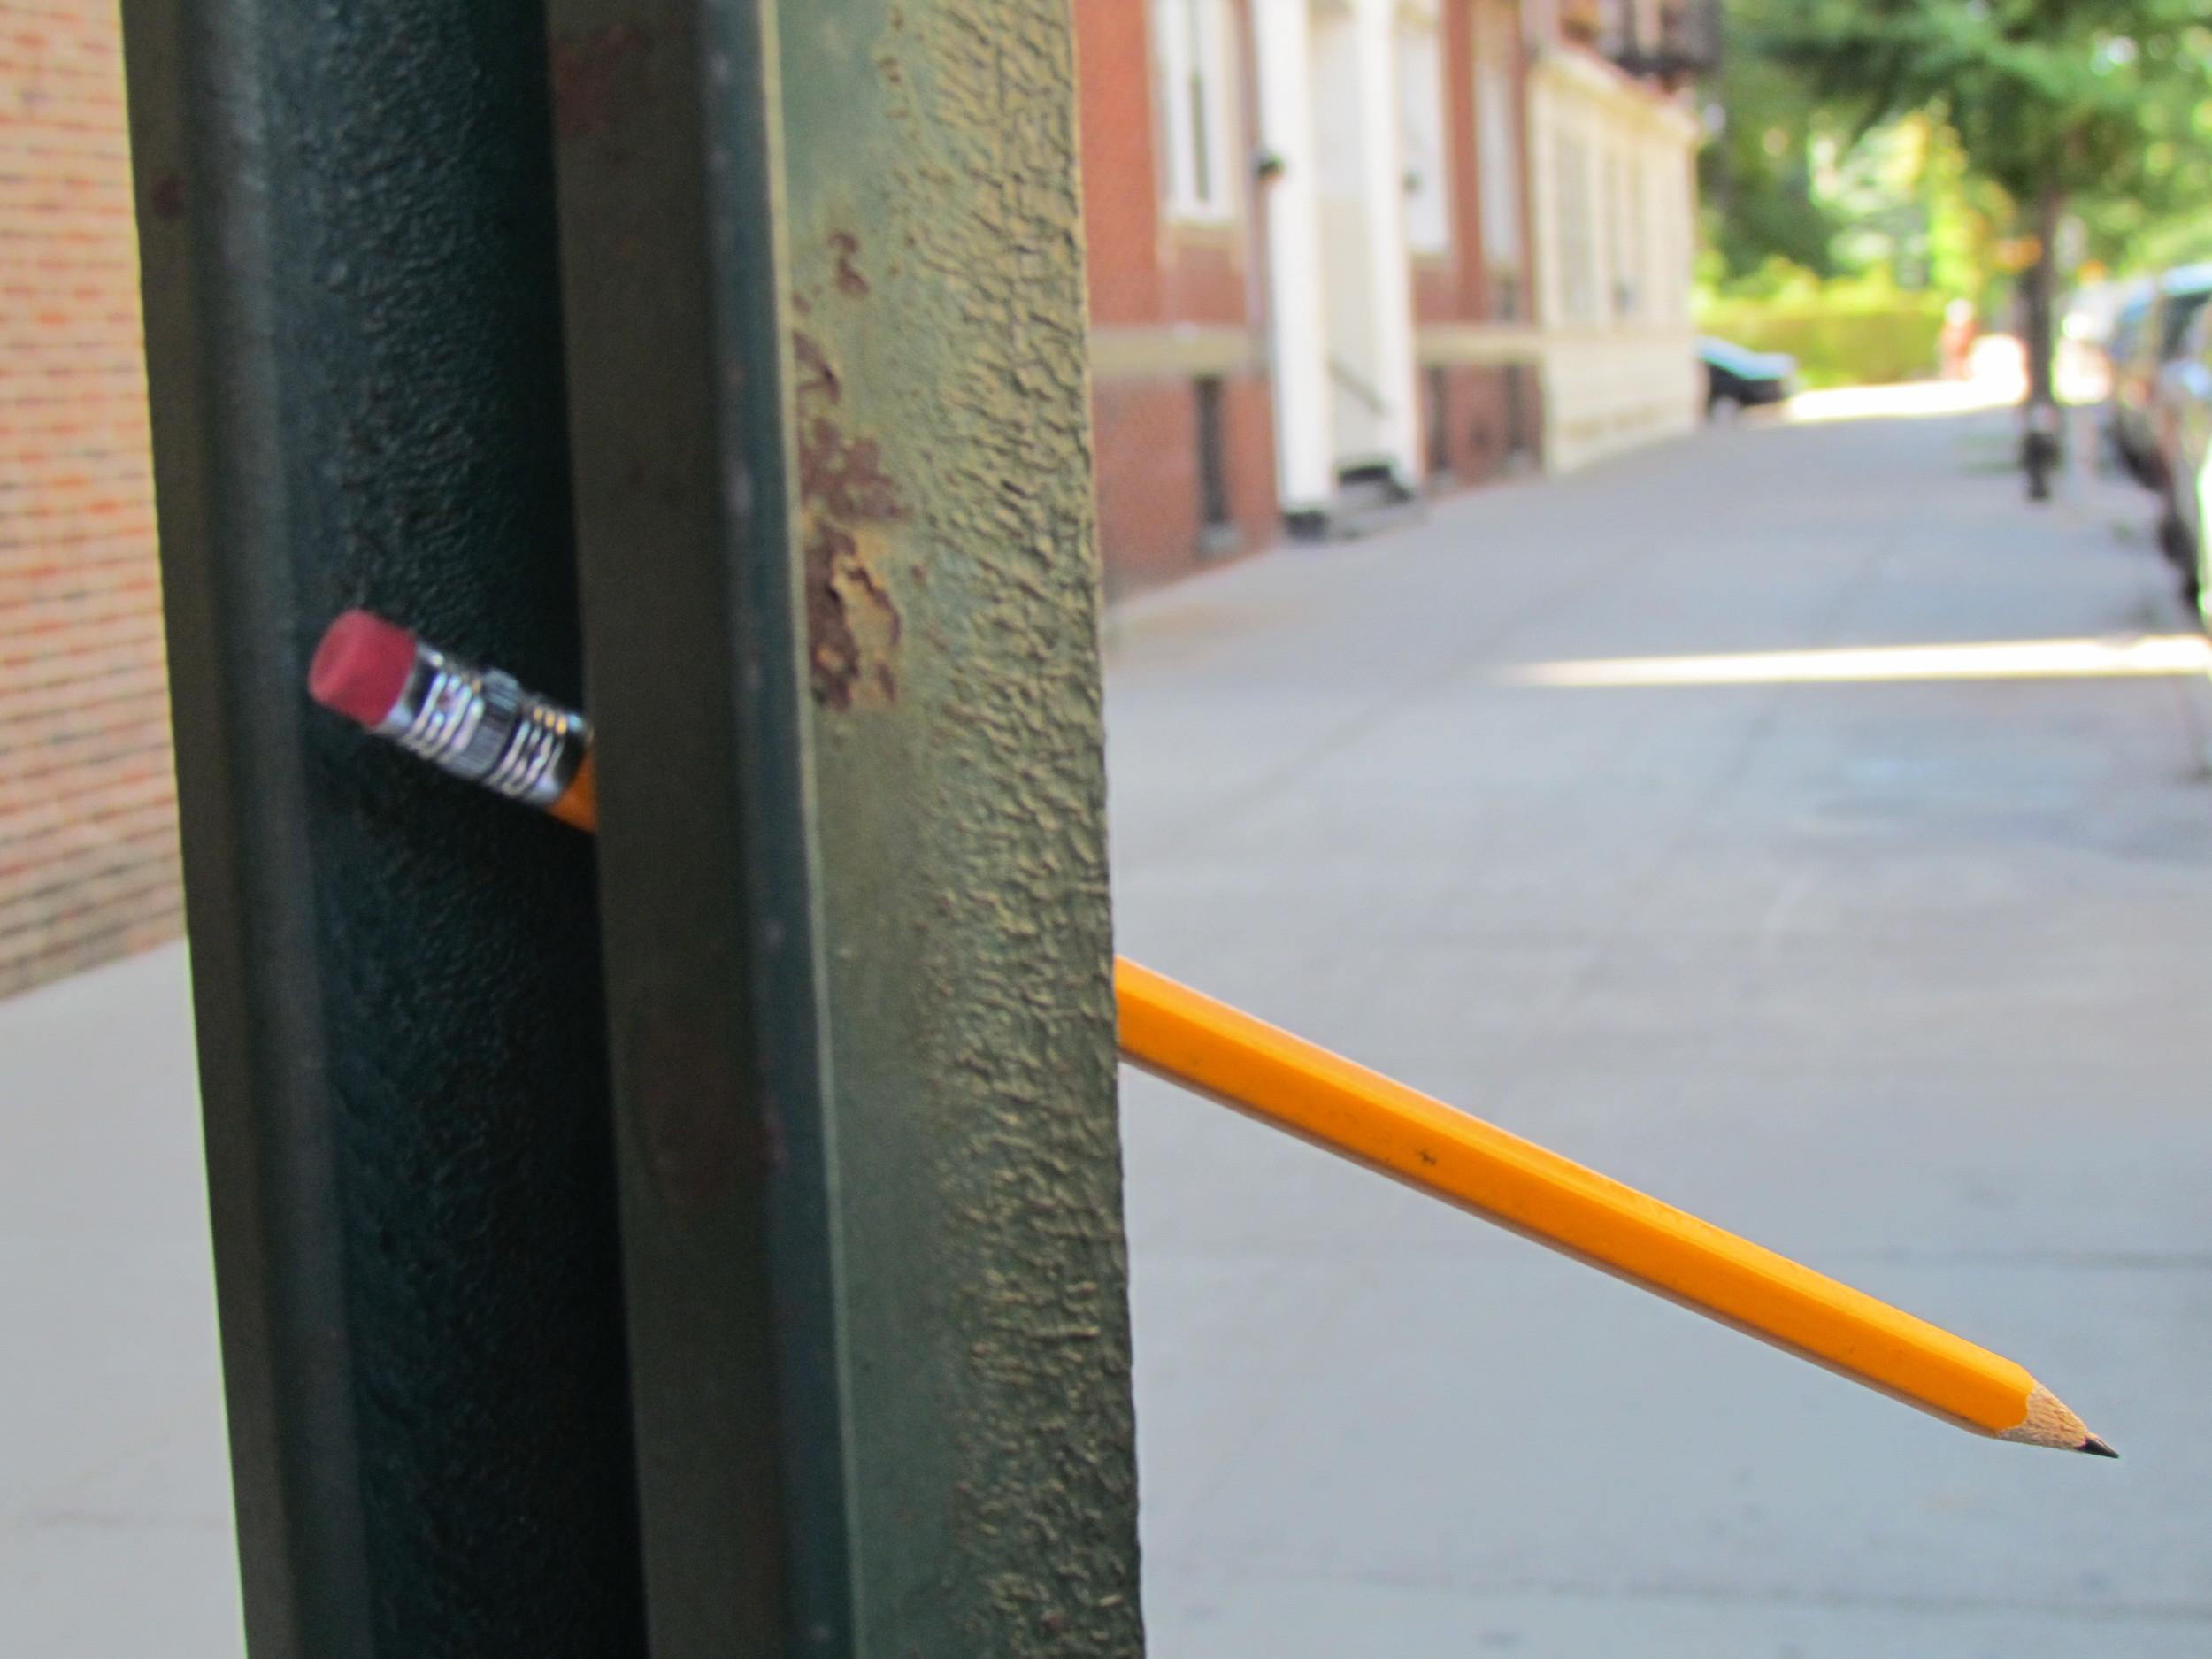 Sharpened Pencils, 2011, New York City